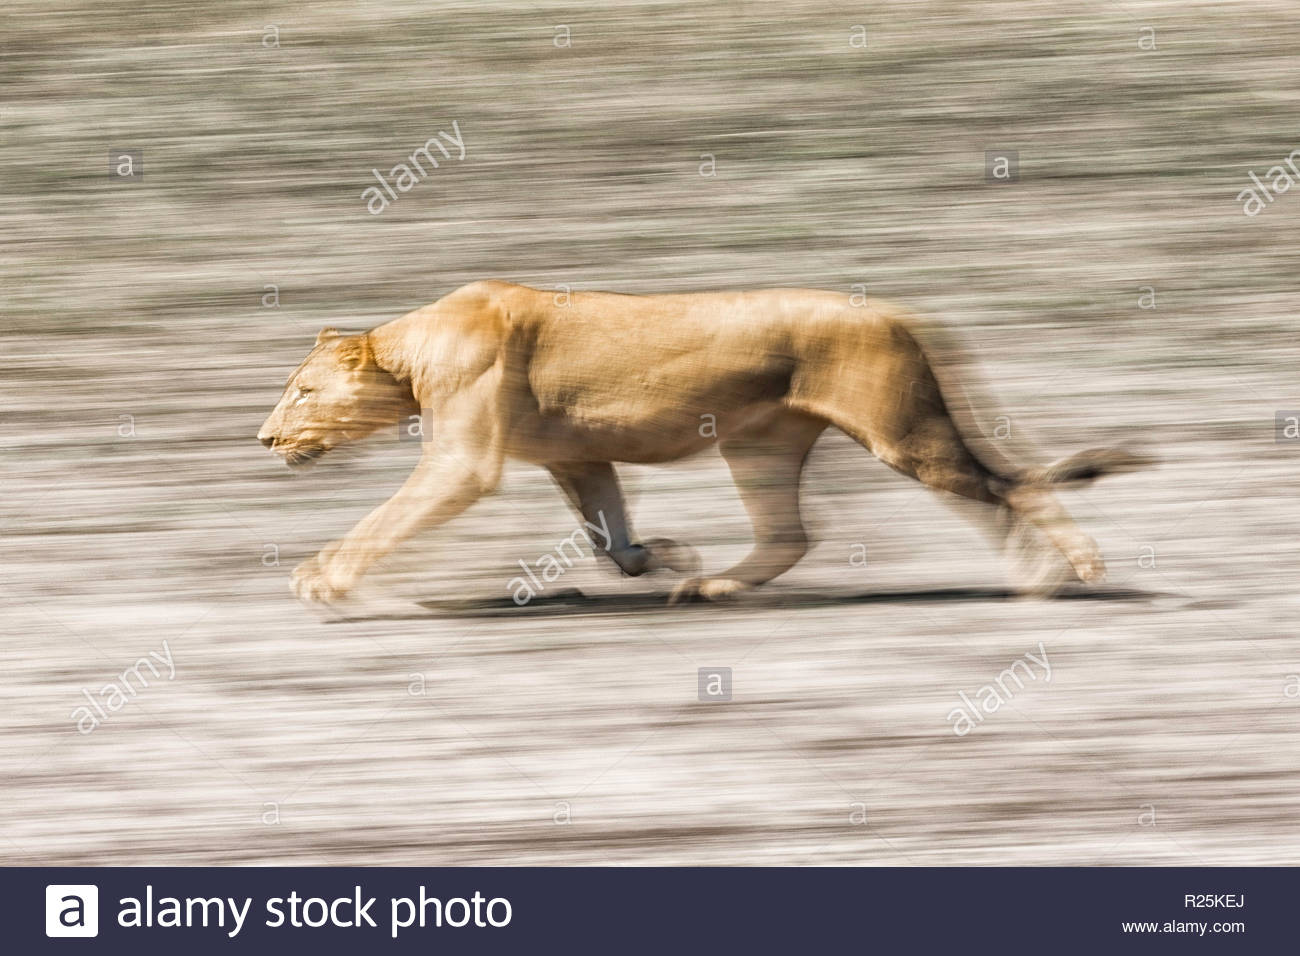 Lion (Pathera leo), Edge of Chobe River, Botswana, Africa - Stock Image